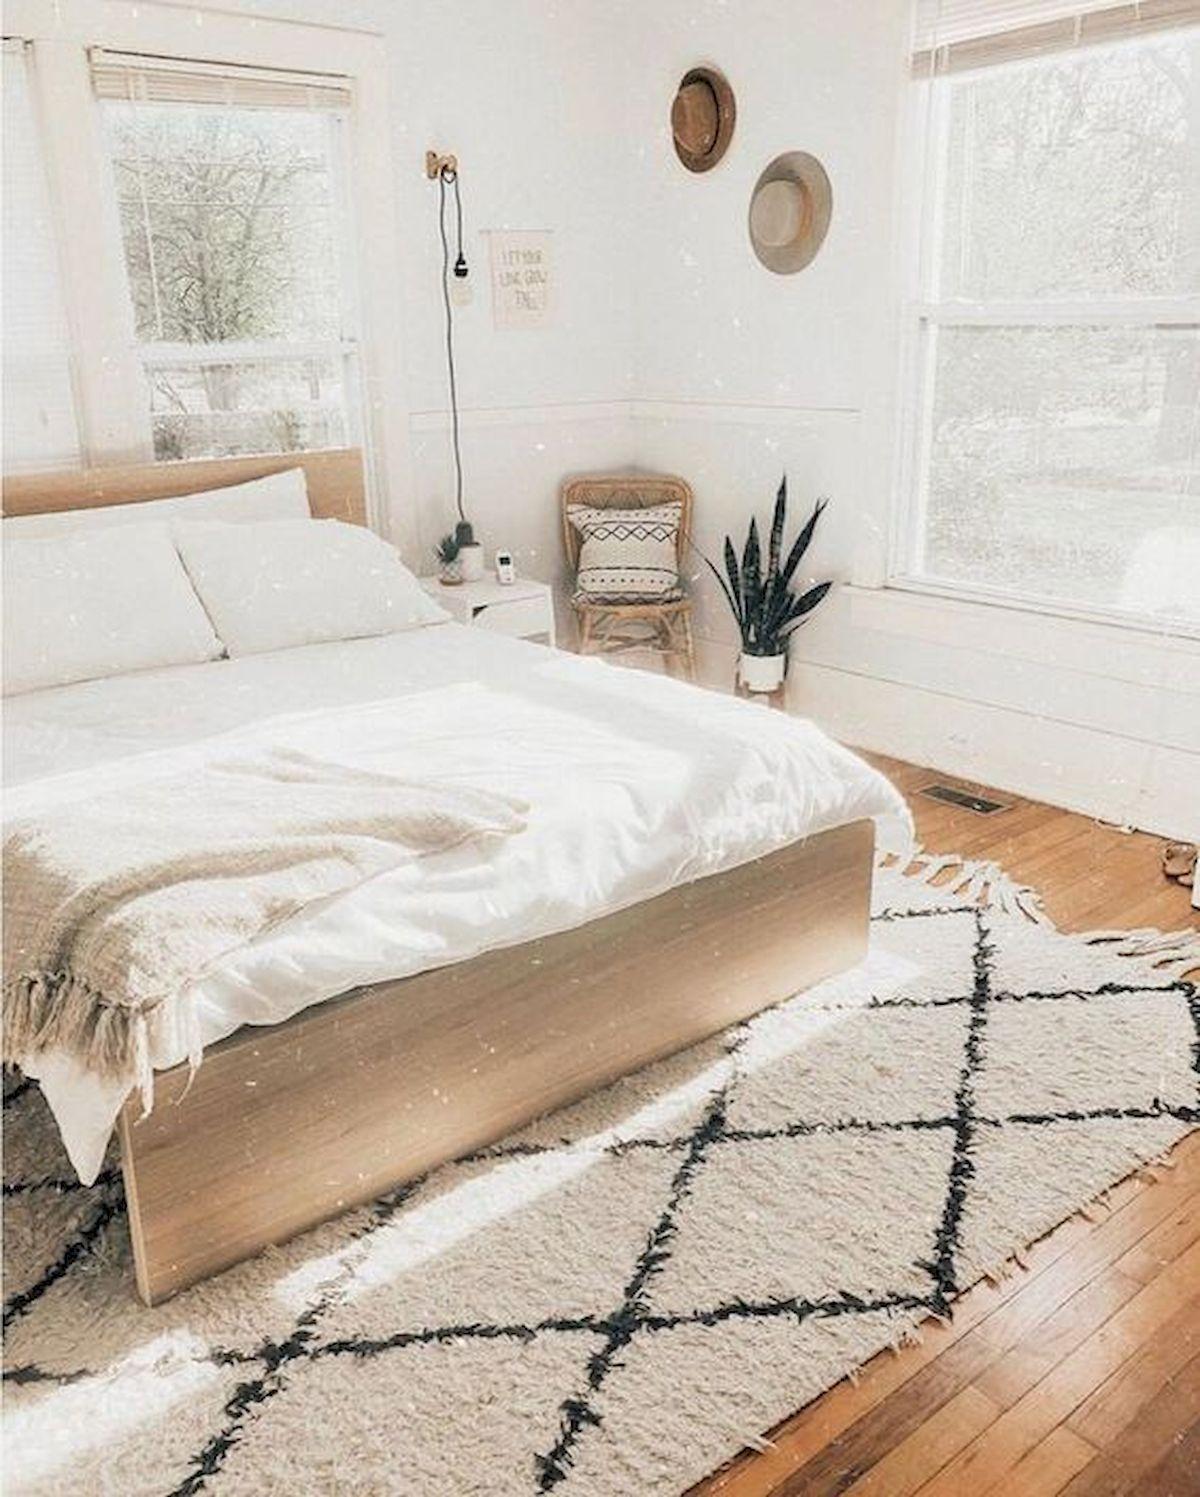 25 Best Bedroom Rug Ideas And Design (3) - CoachDecor.com #bedrooms